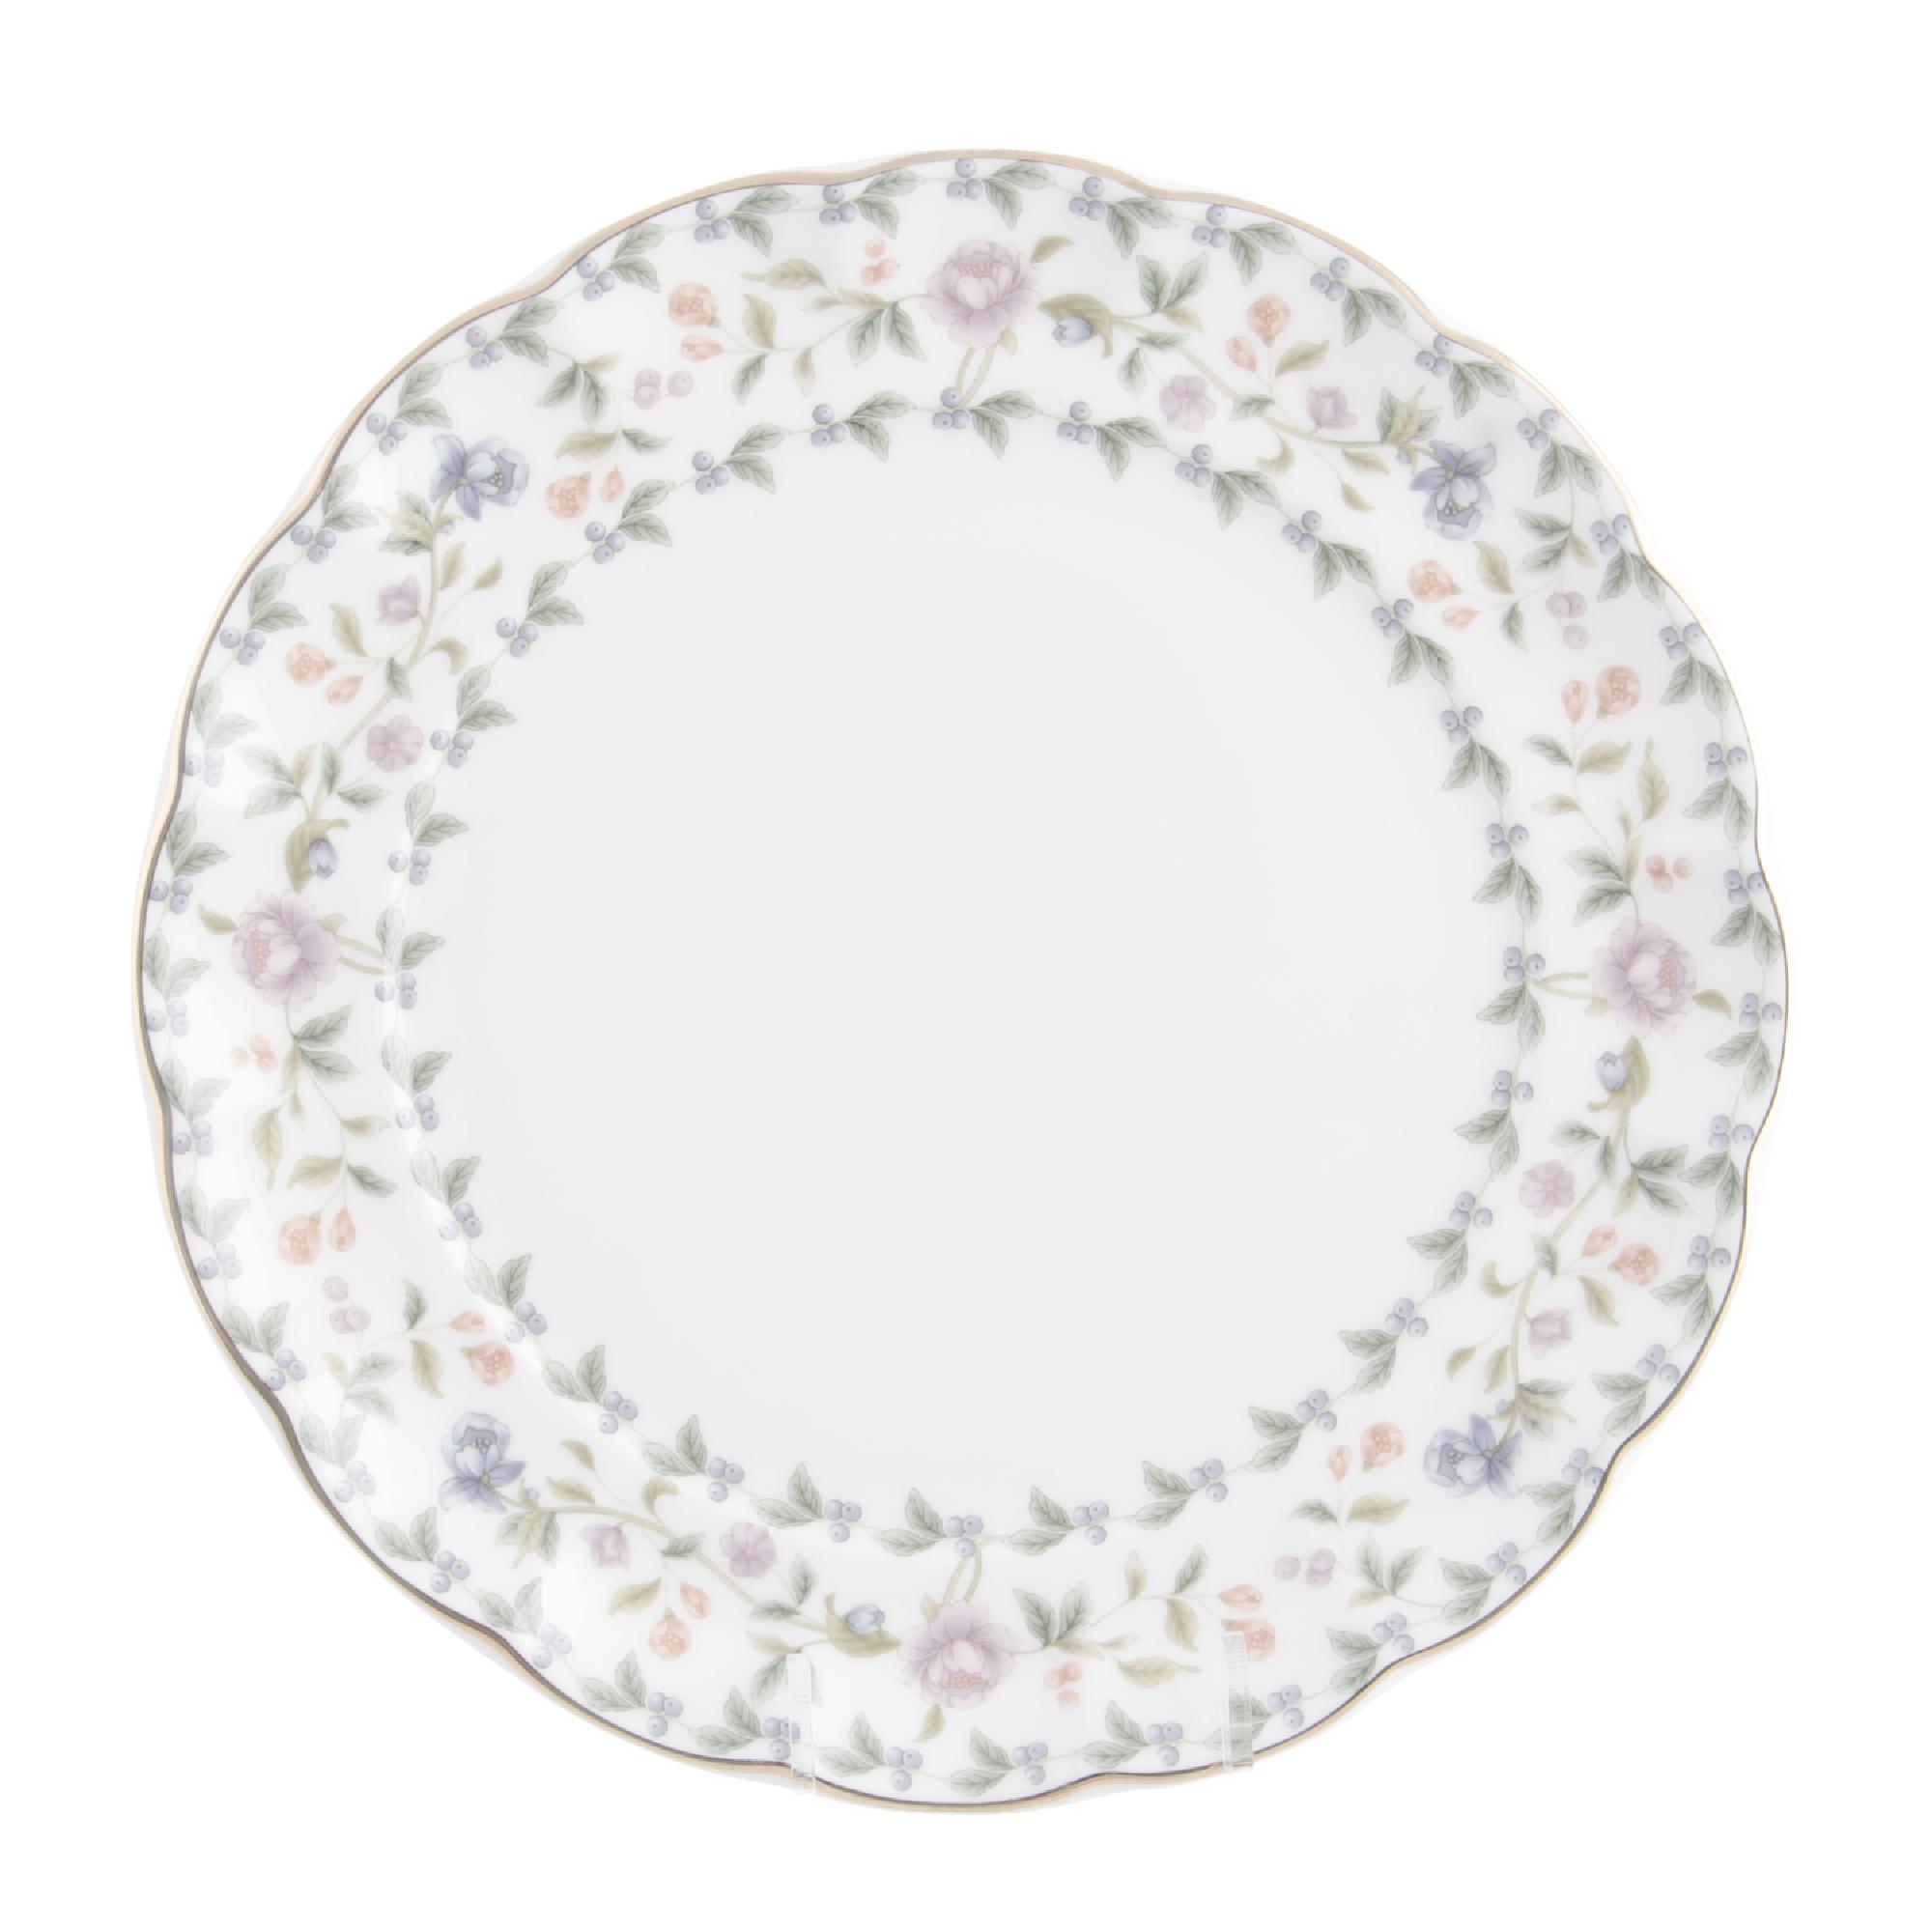 Набор тарелок Hatori 21.5см 6шт санни гарден з санни браун креативные каракули